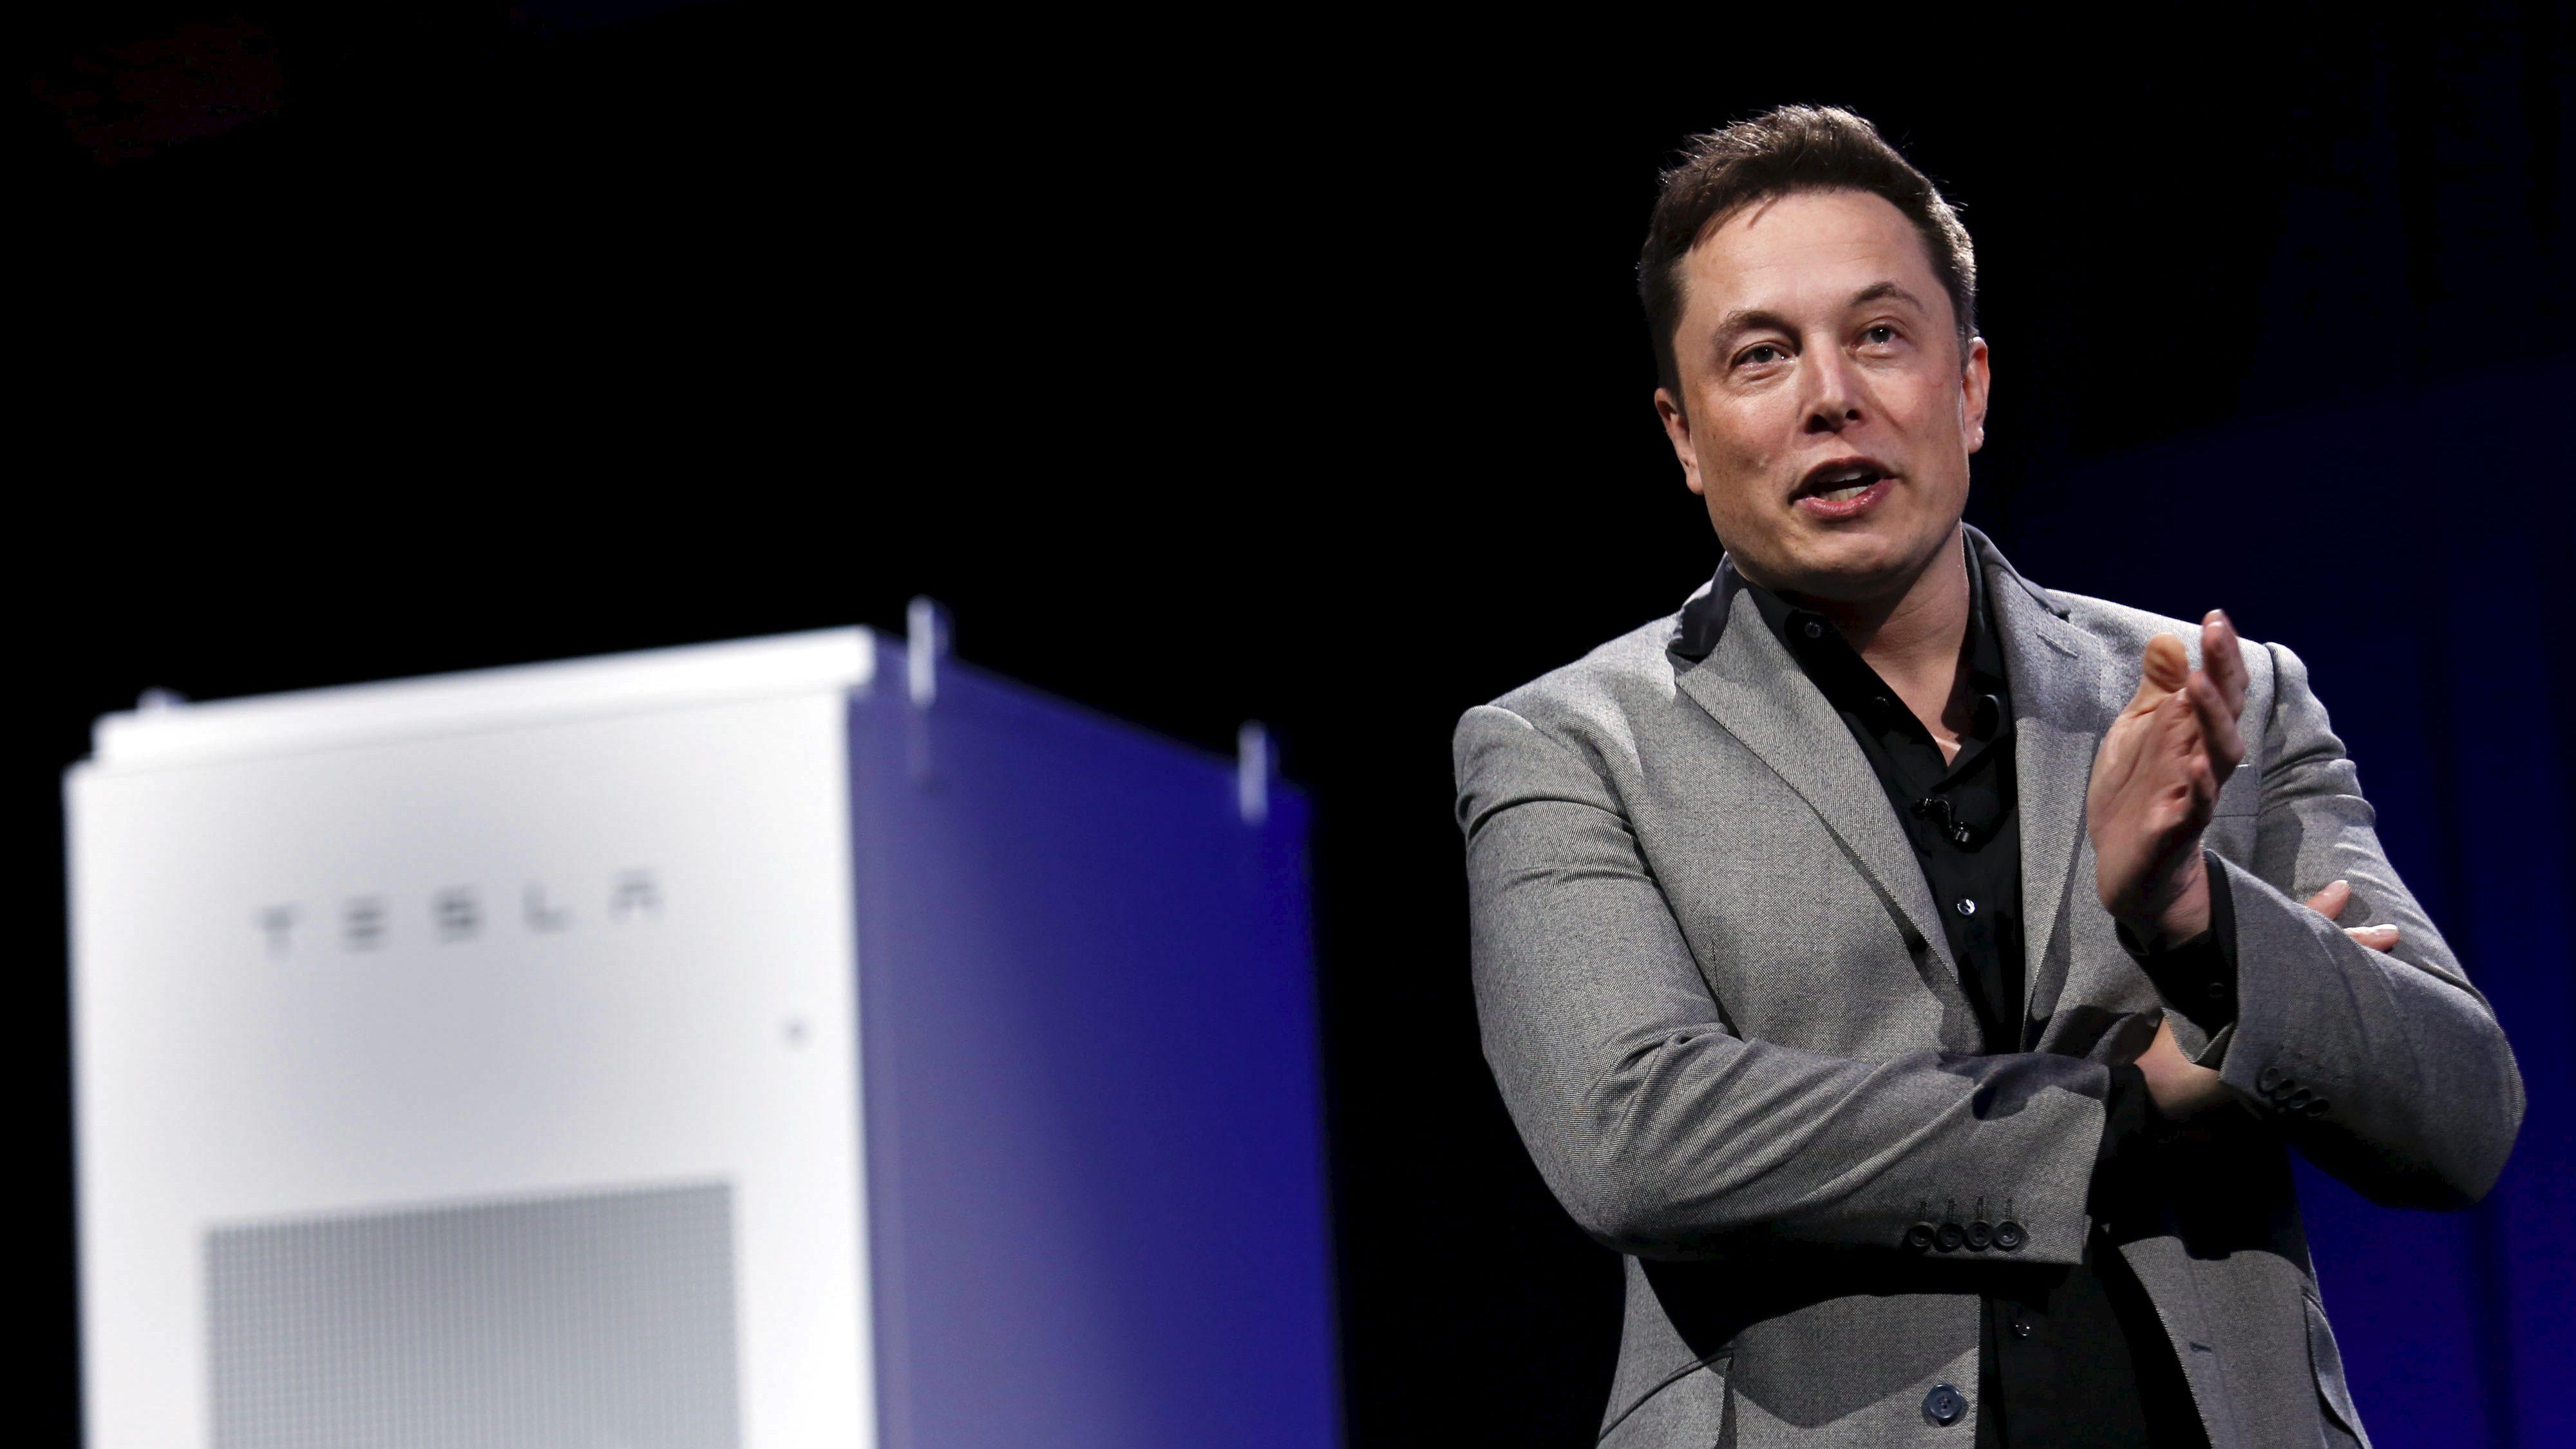 Tesla Motors CEO Elon Musk reveals the Tesla Energy Powerwall Home Battery